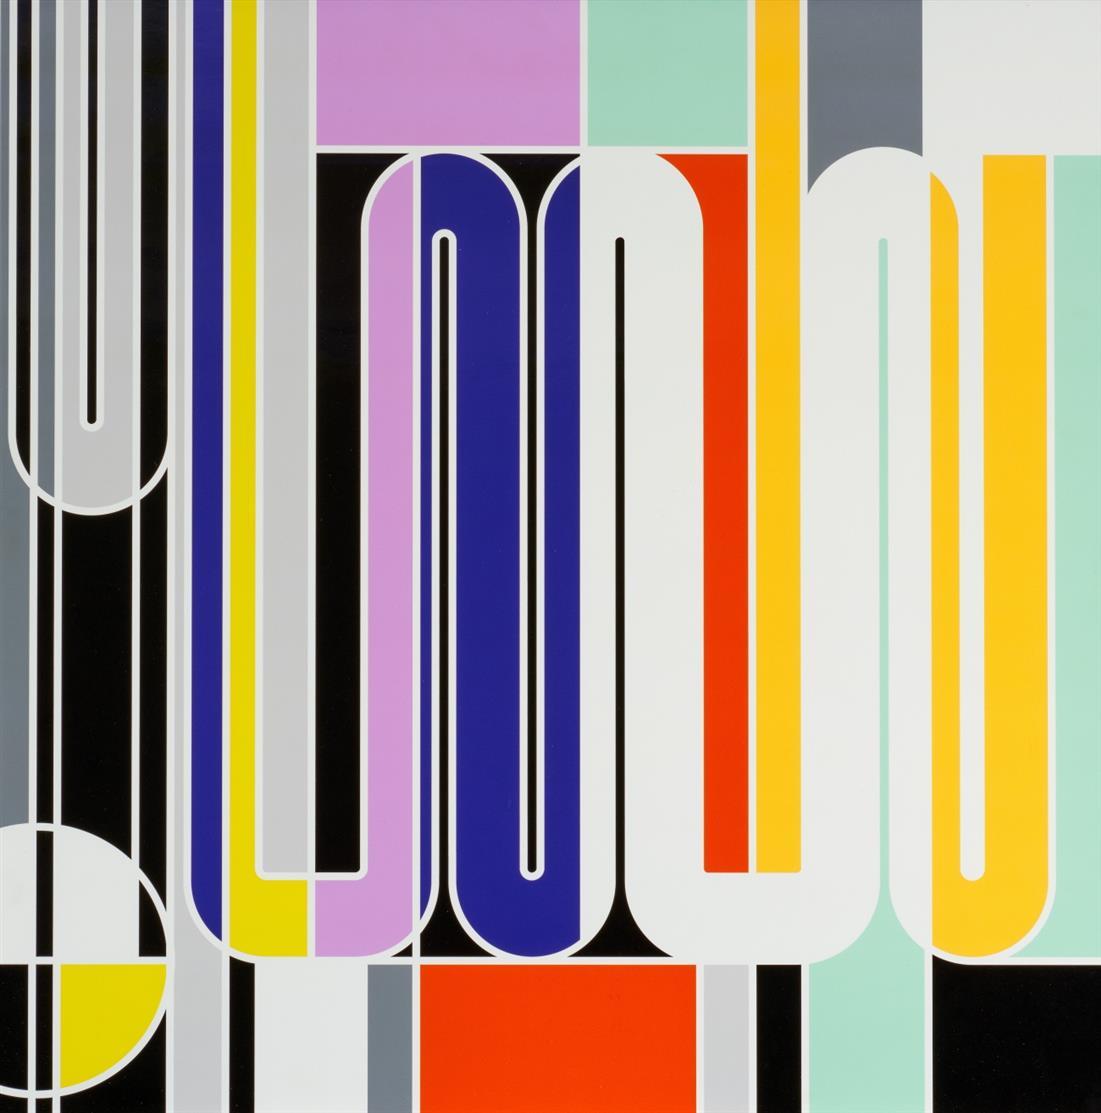 Sarah Morris. Geigy (Clips). 2011. C-Print. Rücks. auf Aufkleber signiert. Ex. 108/120. Texte zur Kunst Edition Nr. 82.